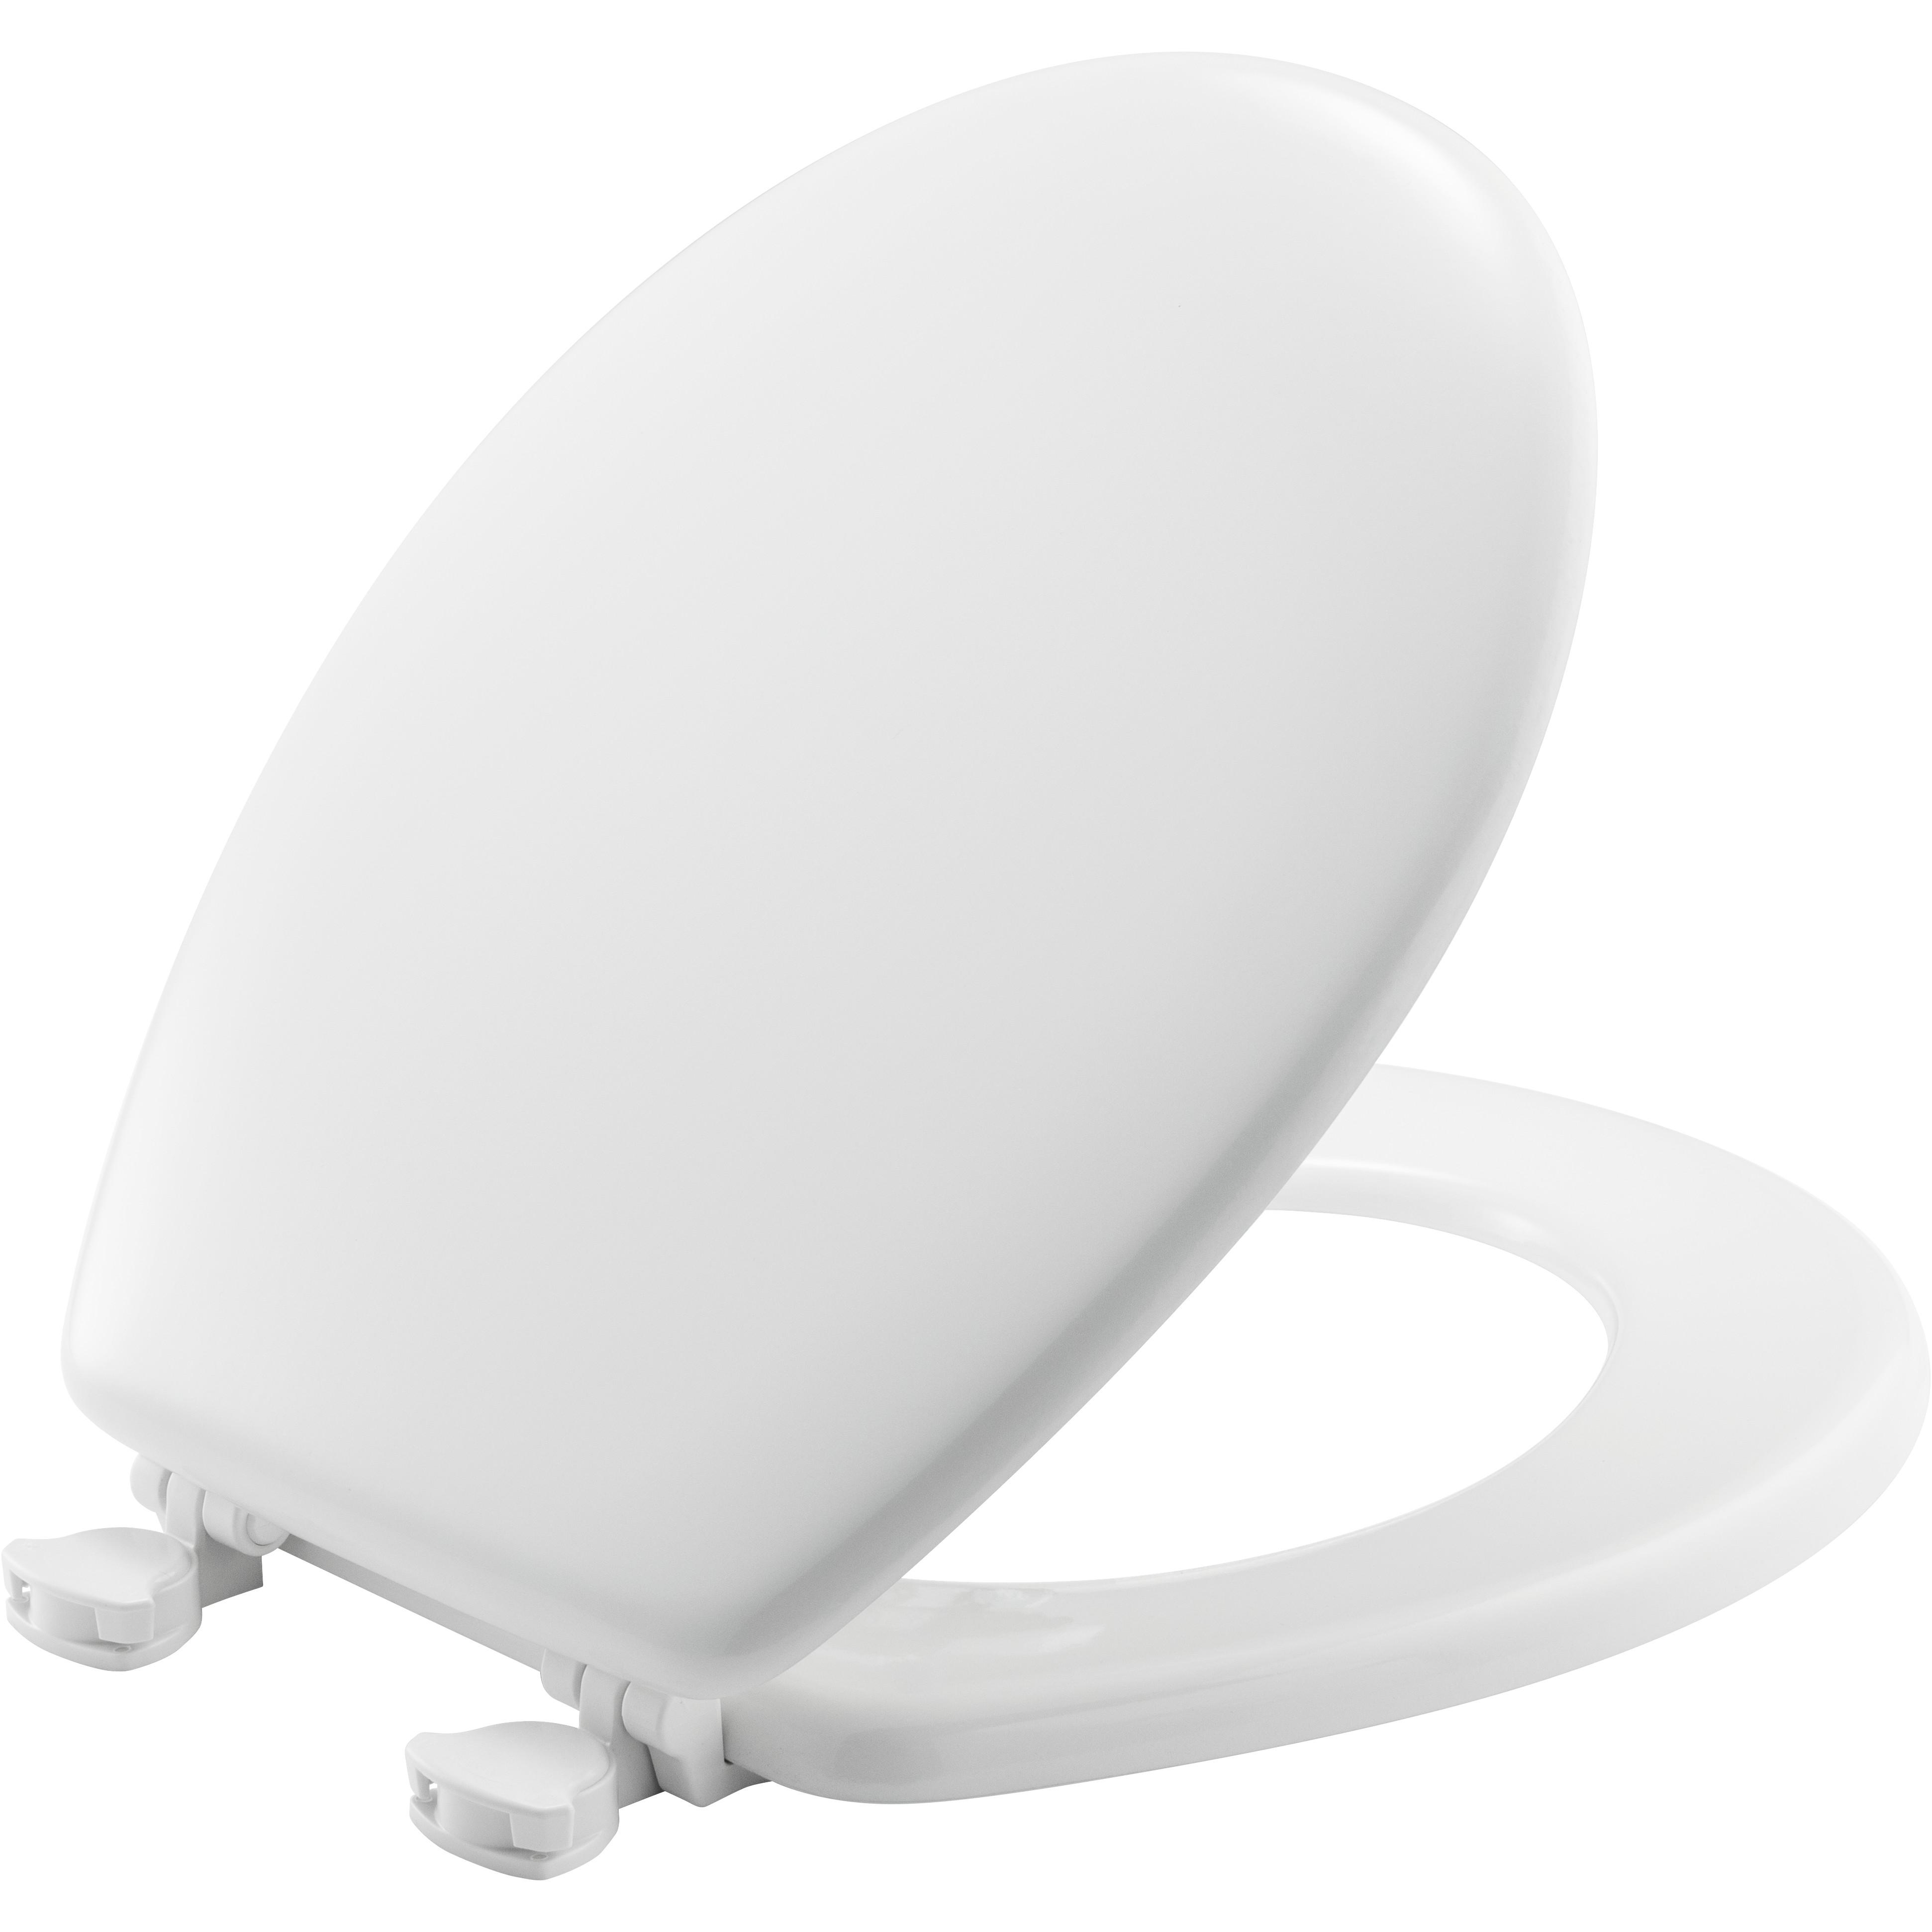 Crane White Centoco 700-301 Centocore Molded Wood Technology Round Toilet Seat